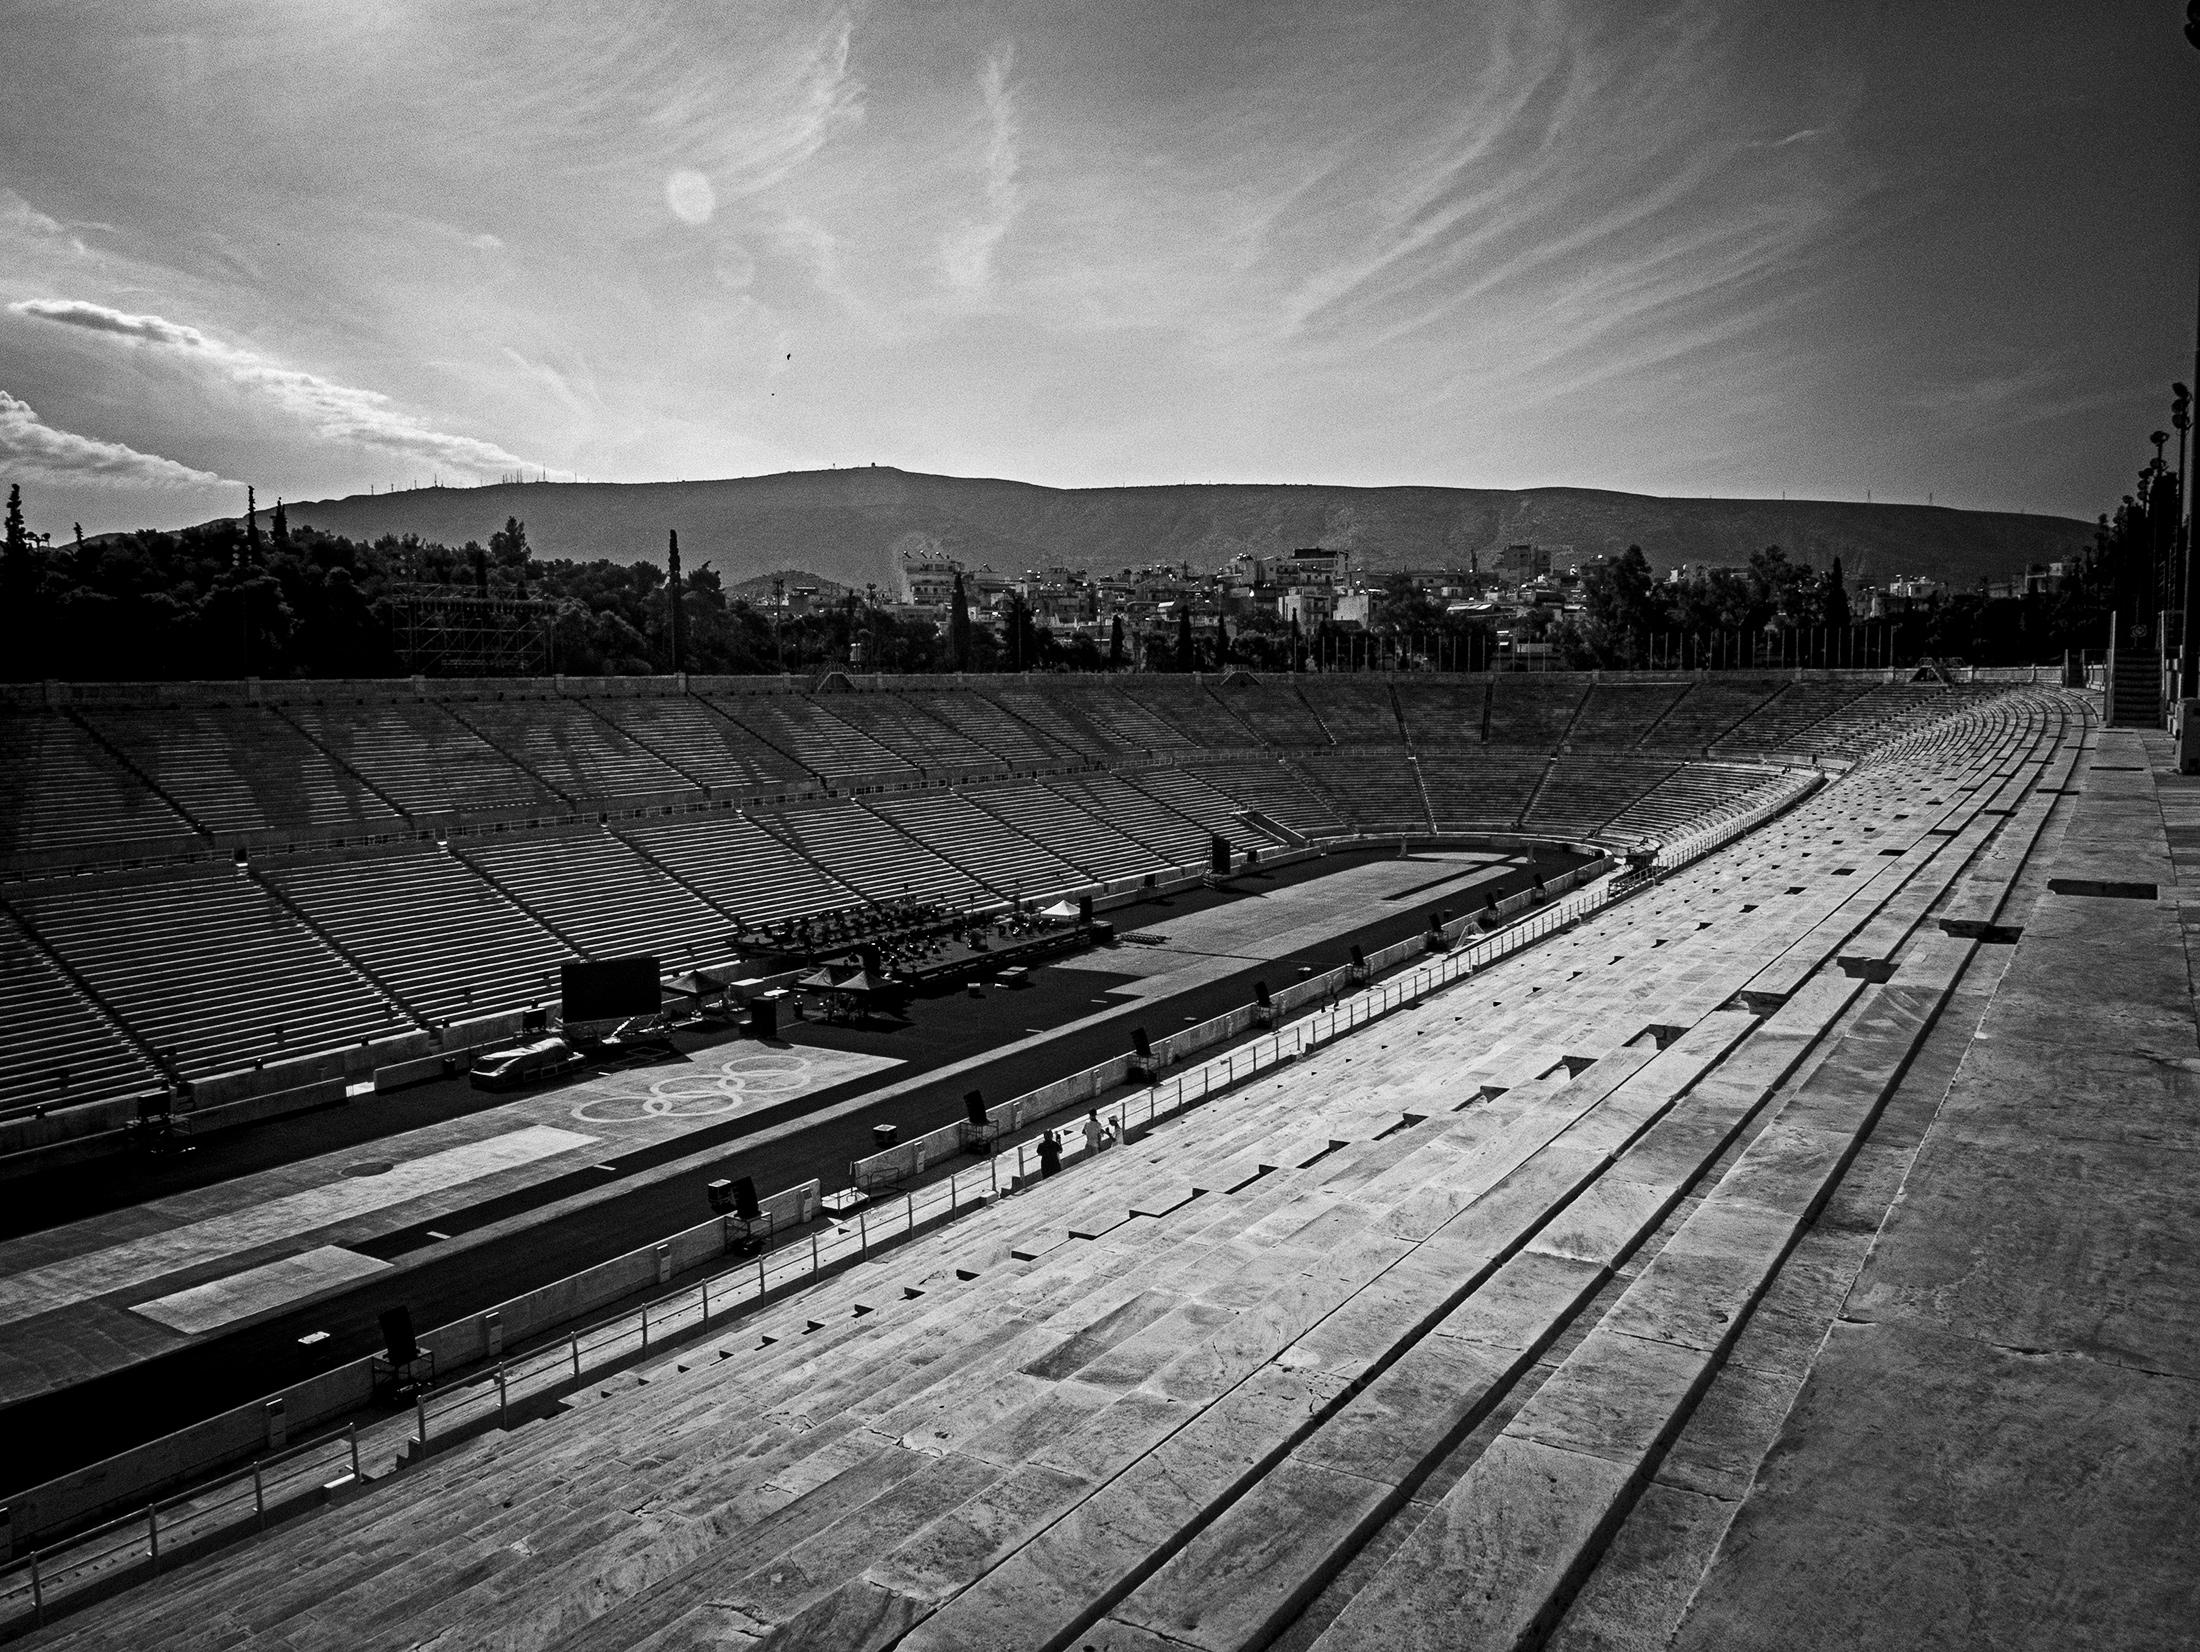 Panathenaic Stadium, Athens, Jarred Elrod, Greece, Photography